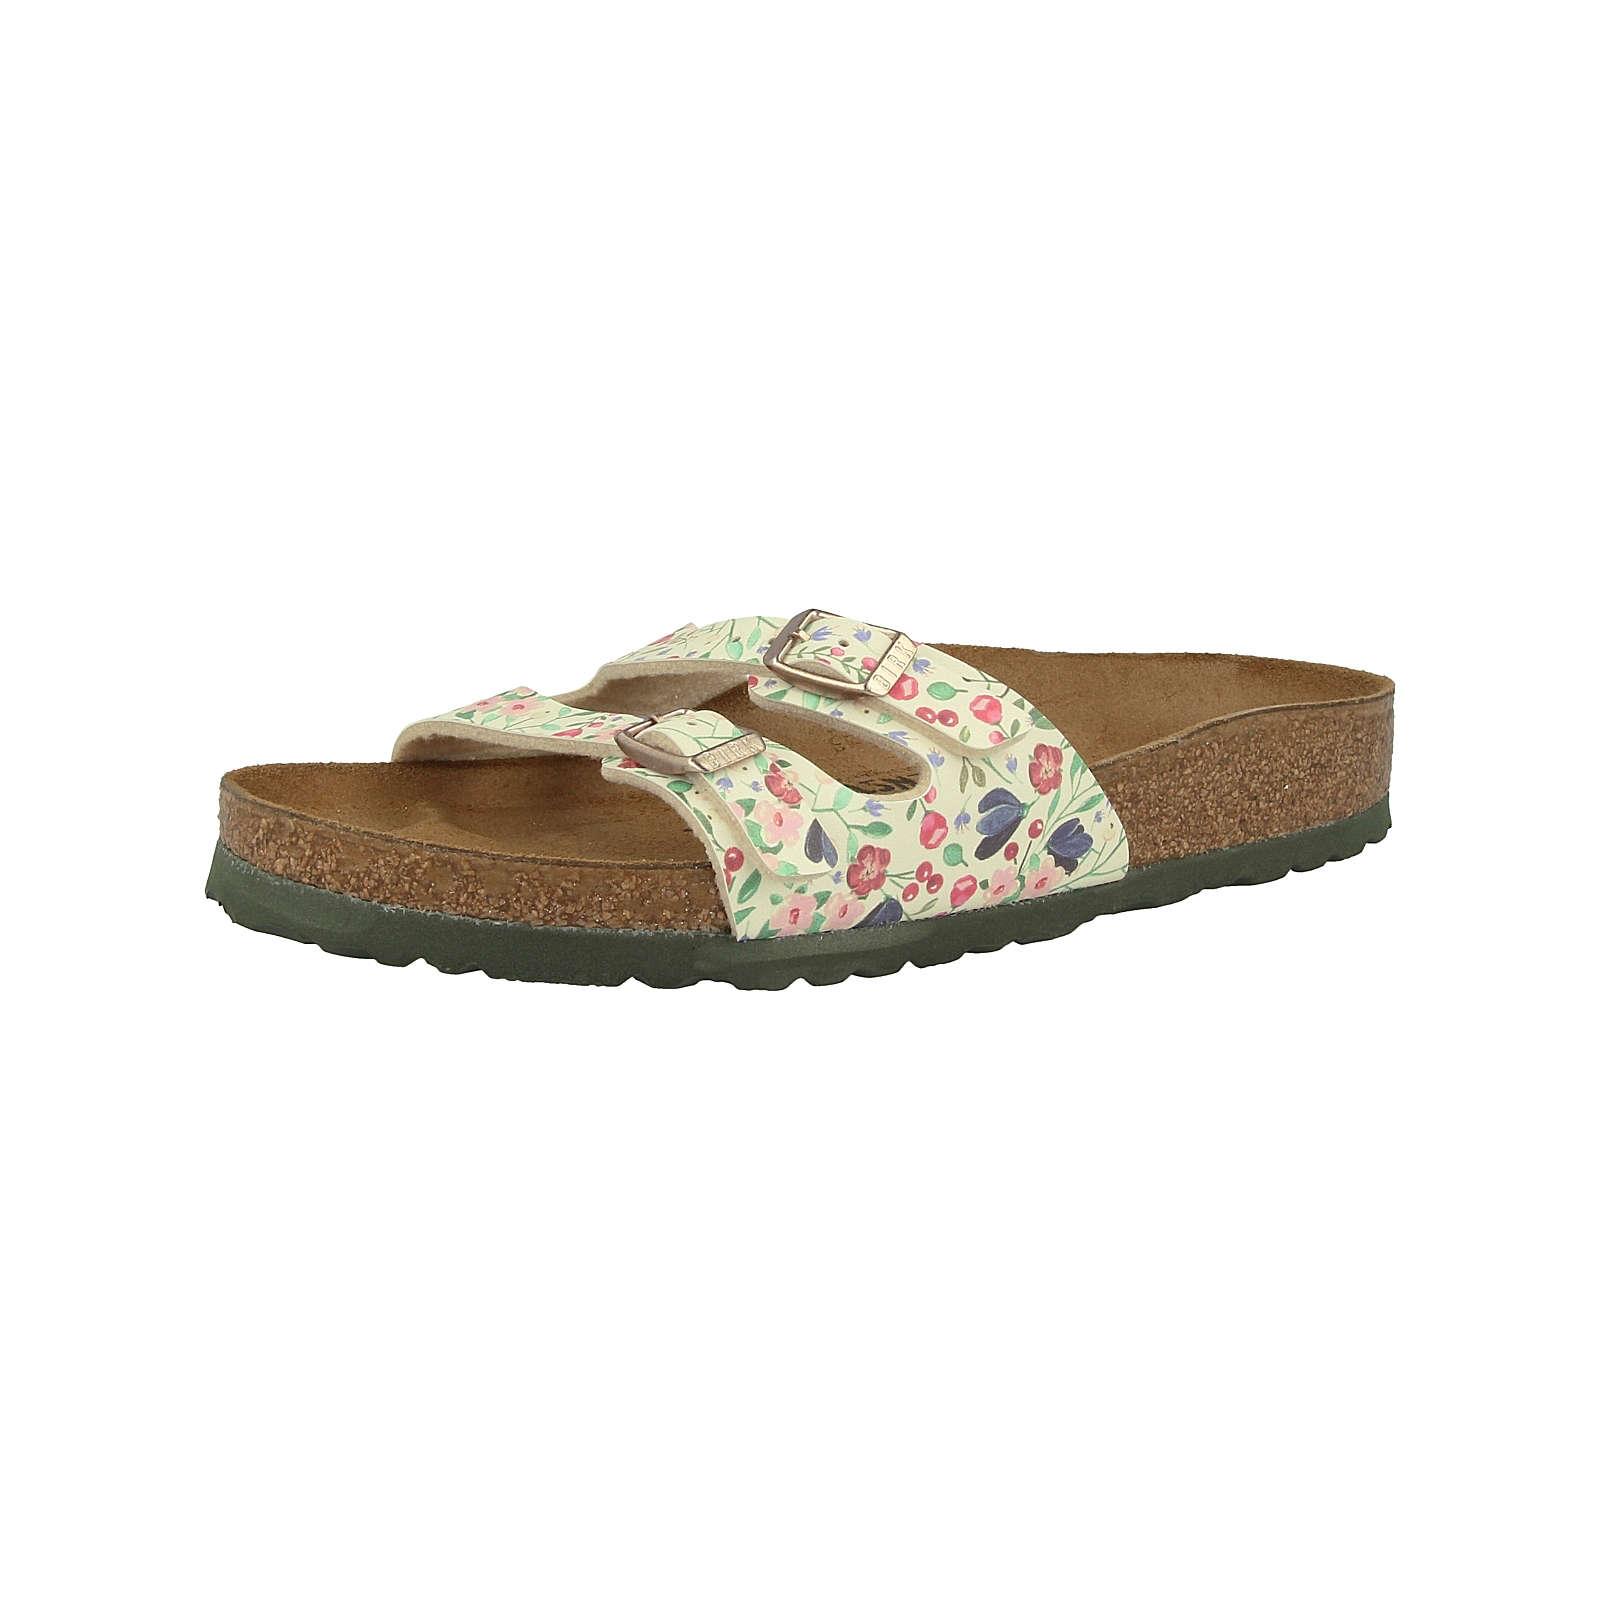 BIRKENSTOCK Schuhe Ibiza Birko-Flor schmal Pantoletten grün Damen Gr. 37